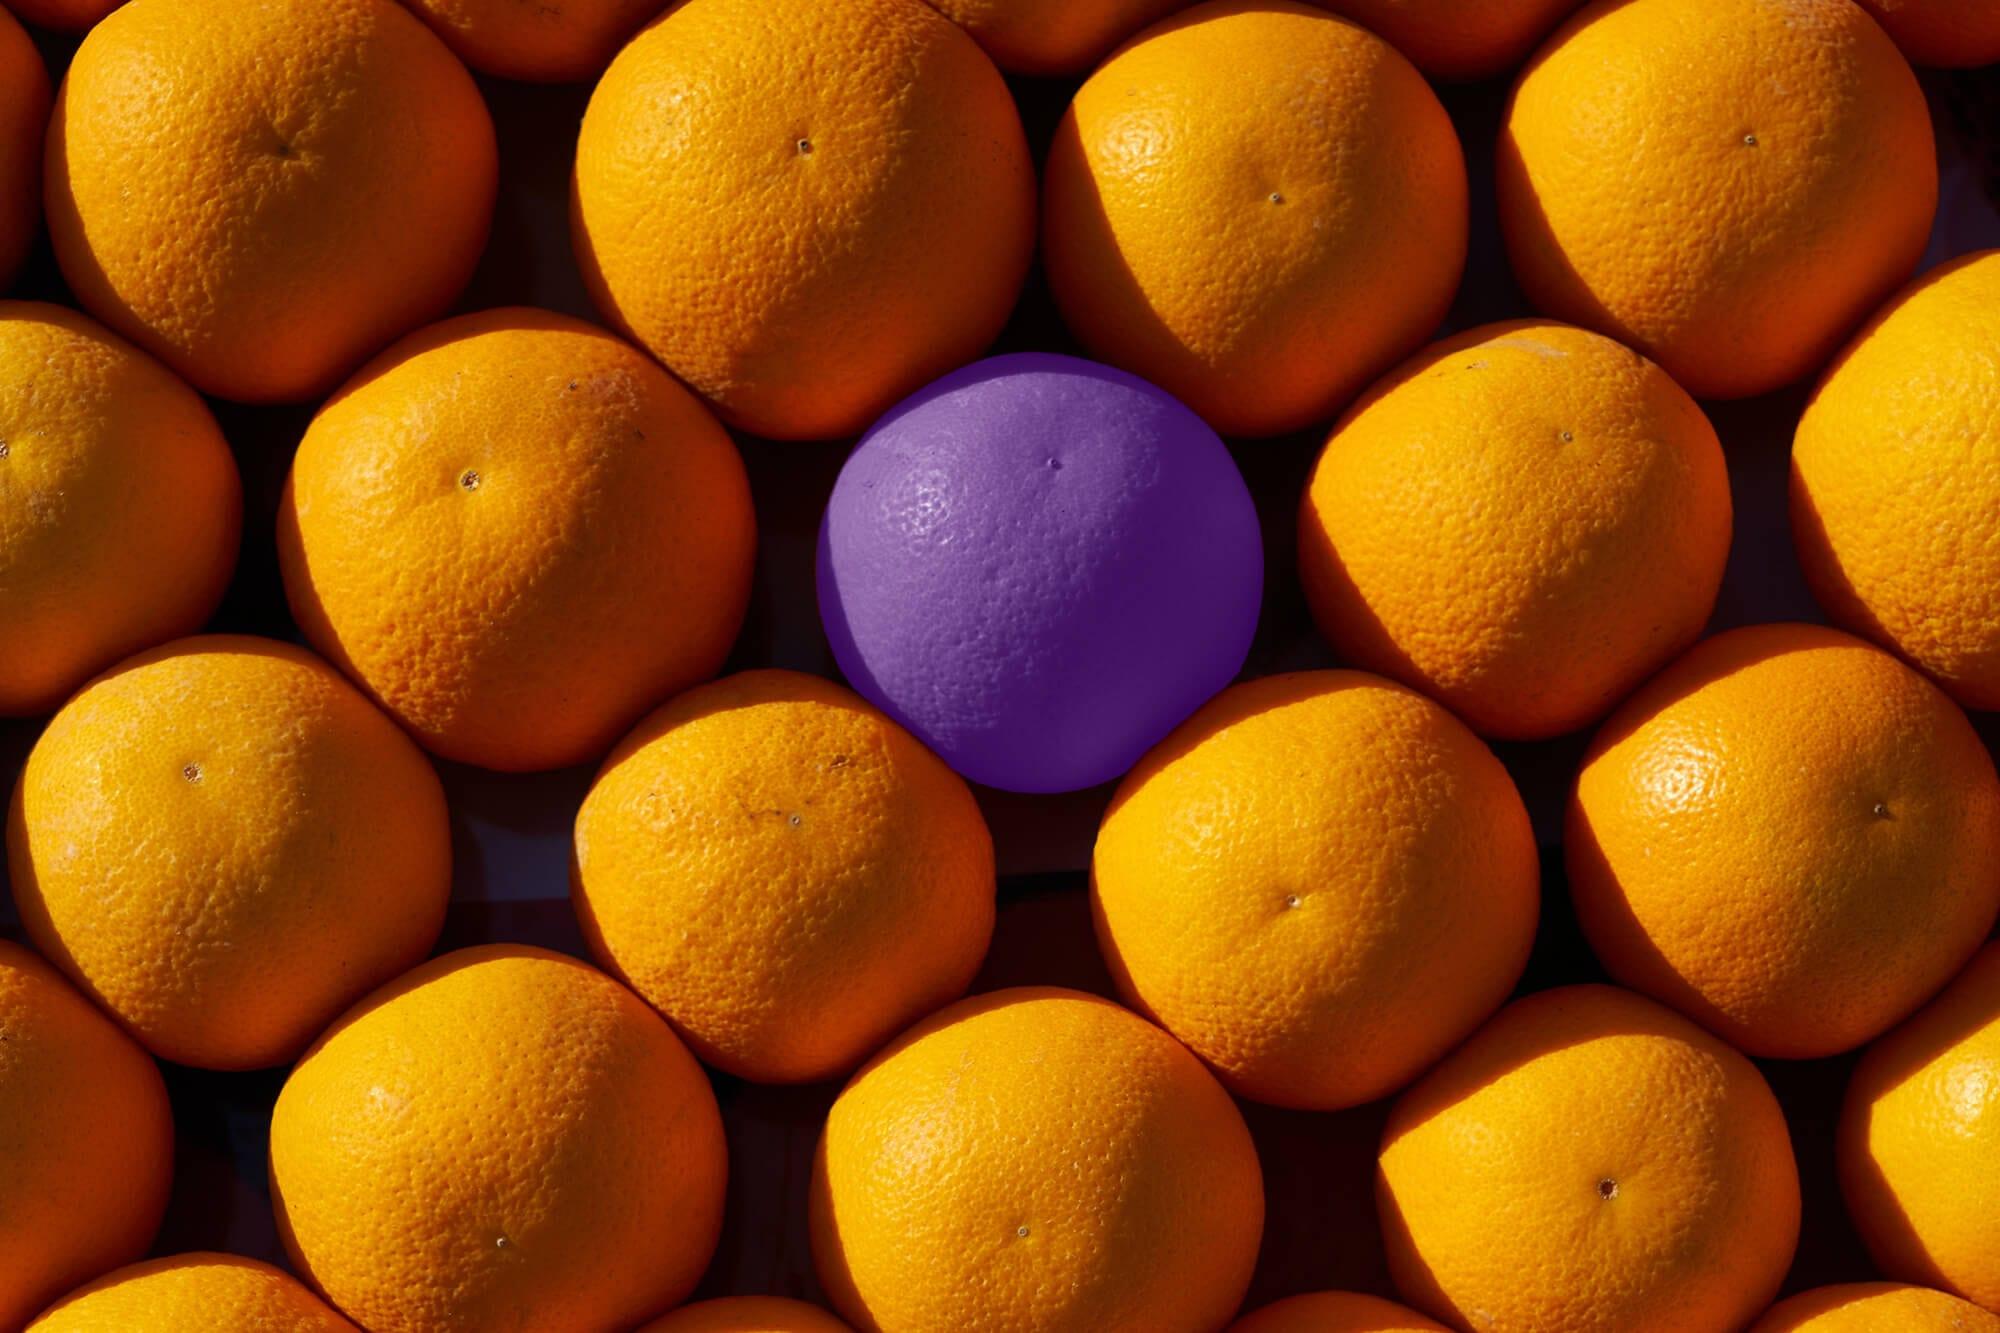 Oranges - one purple